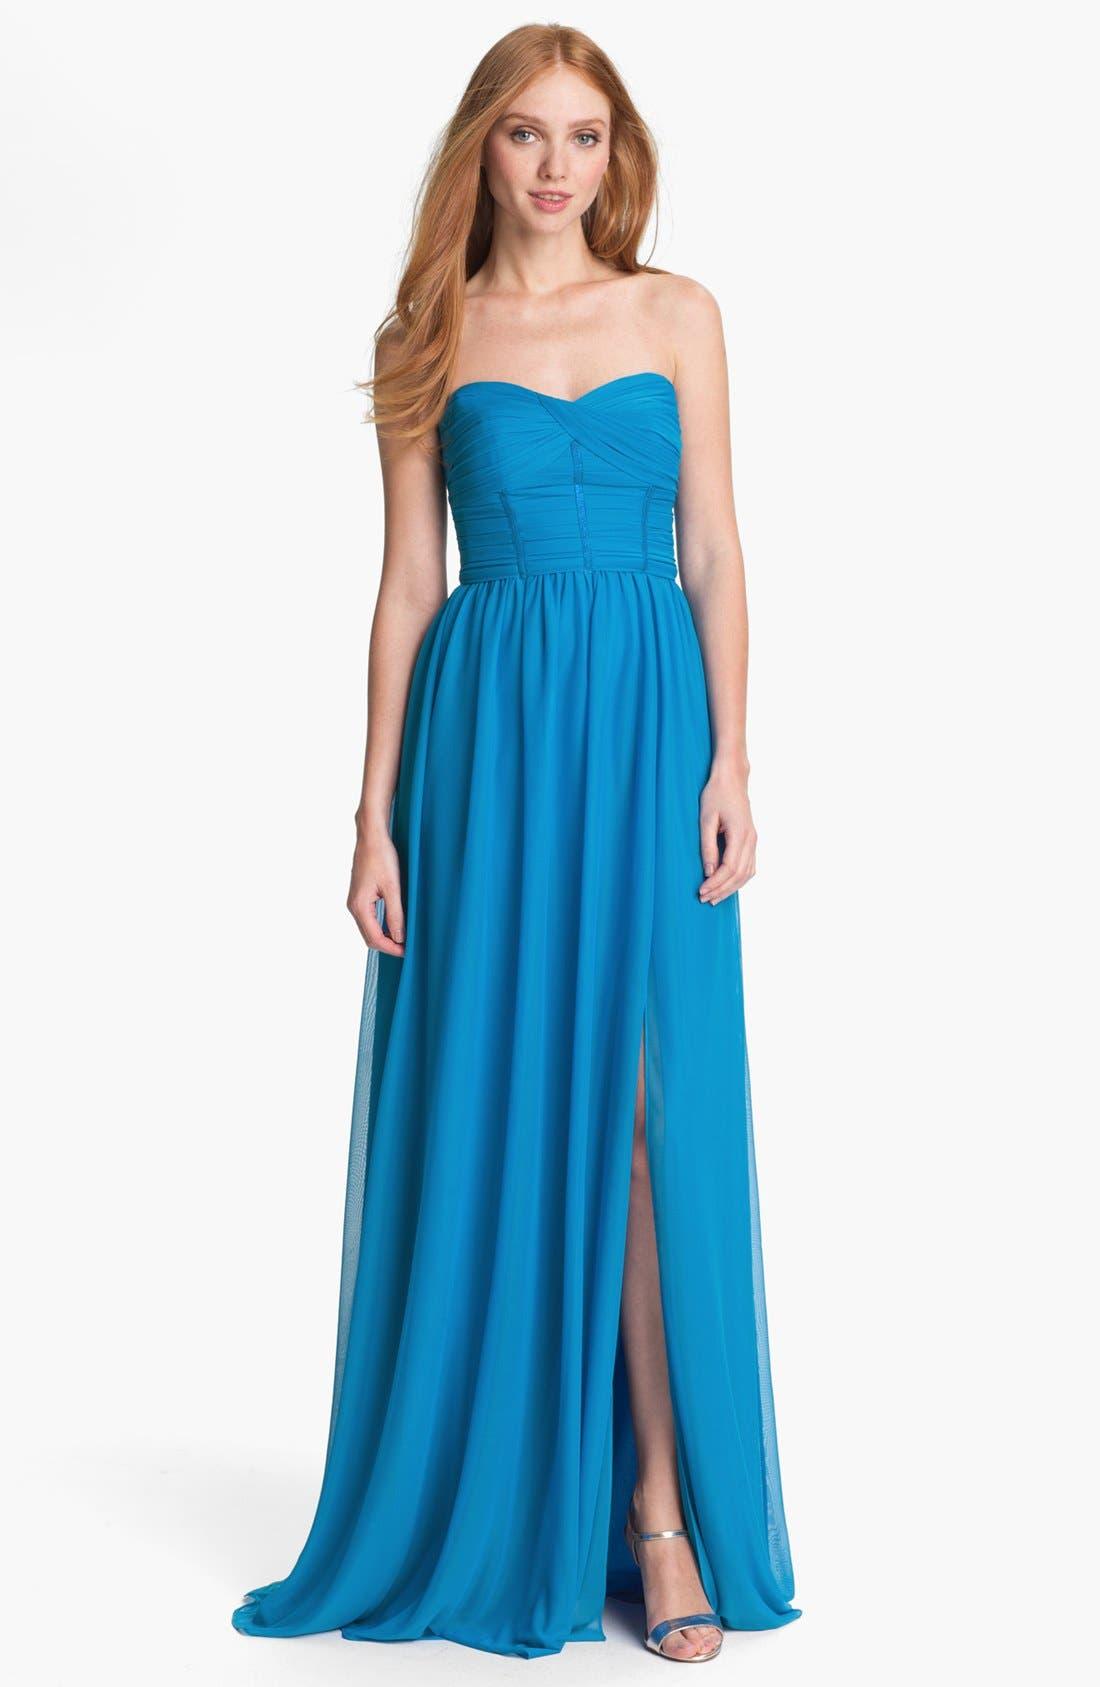 Alternate Image 1 Selected - ML Monique Lhuillier Bridesmaids Strapless Mesh Gown